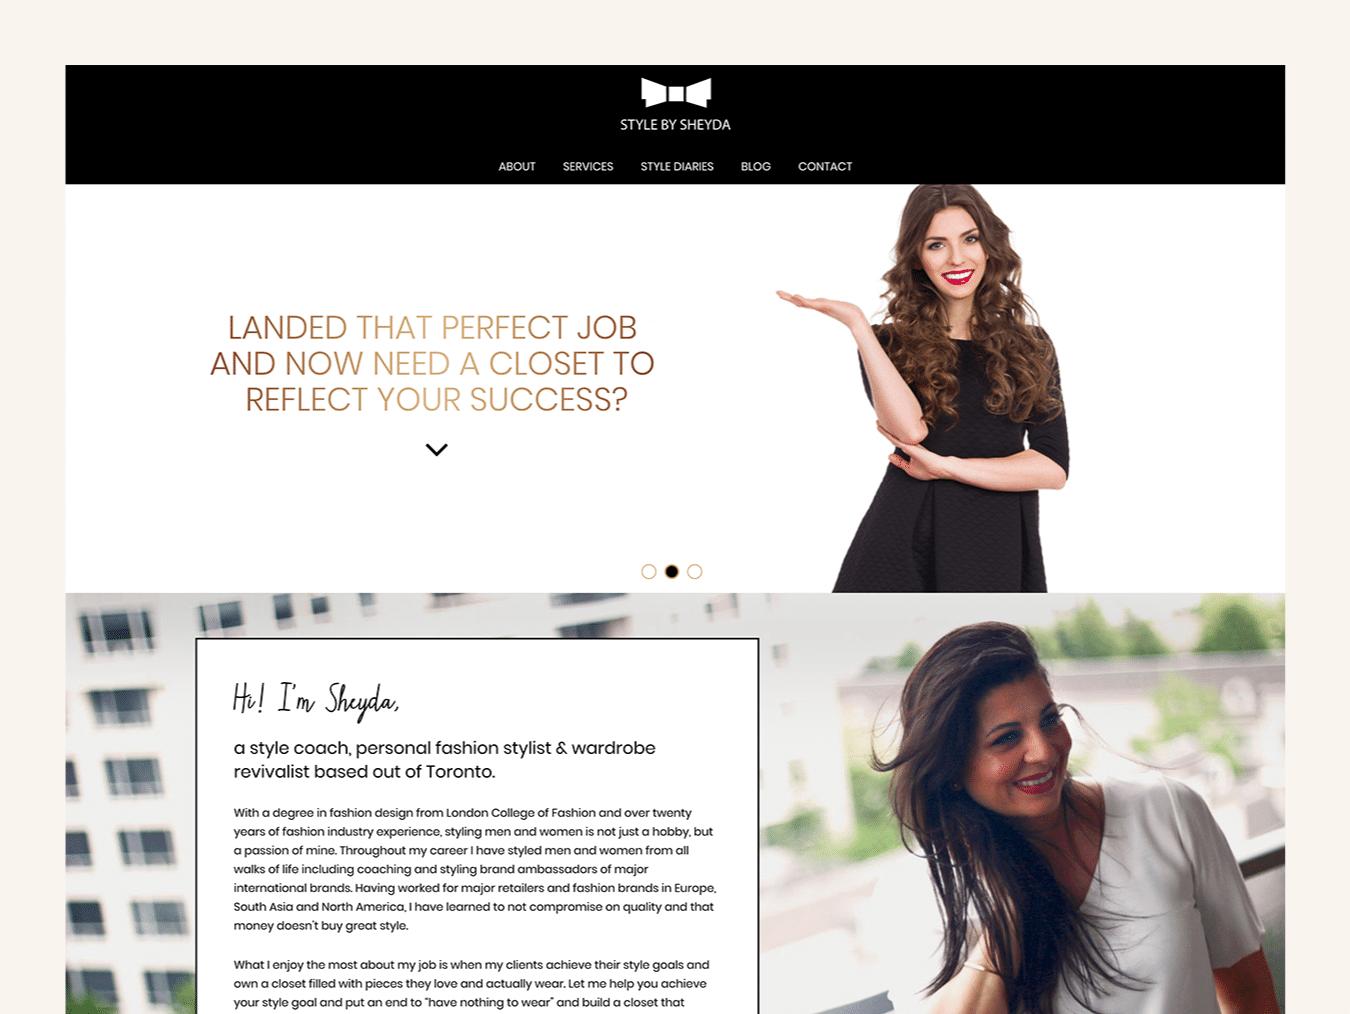 Fashion Web Design – Style by Sheyda (Thumbnail Design)